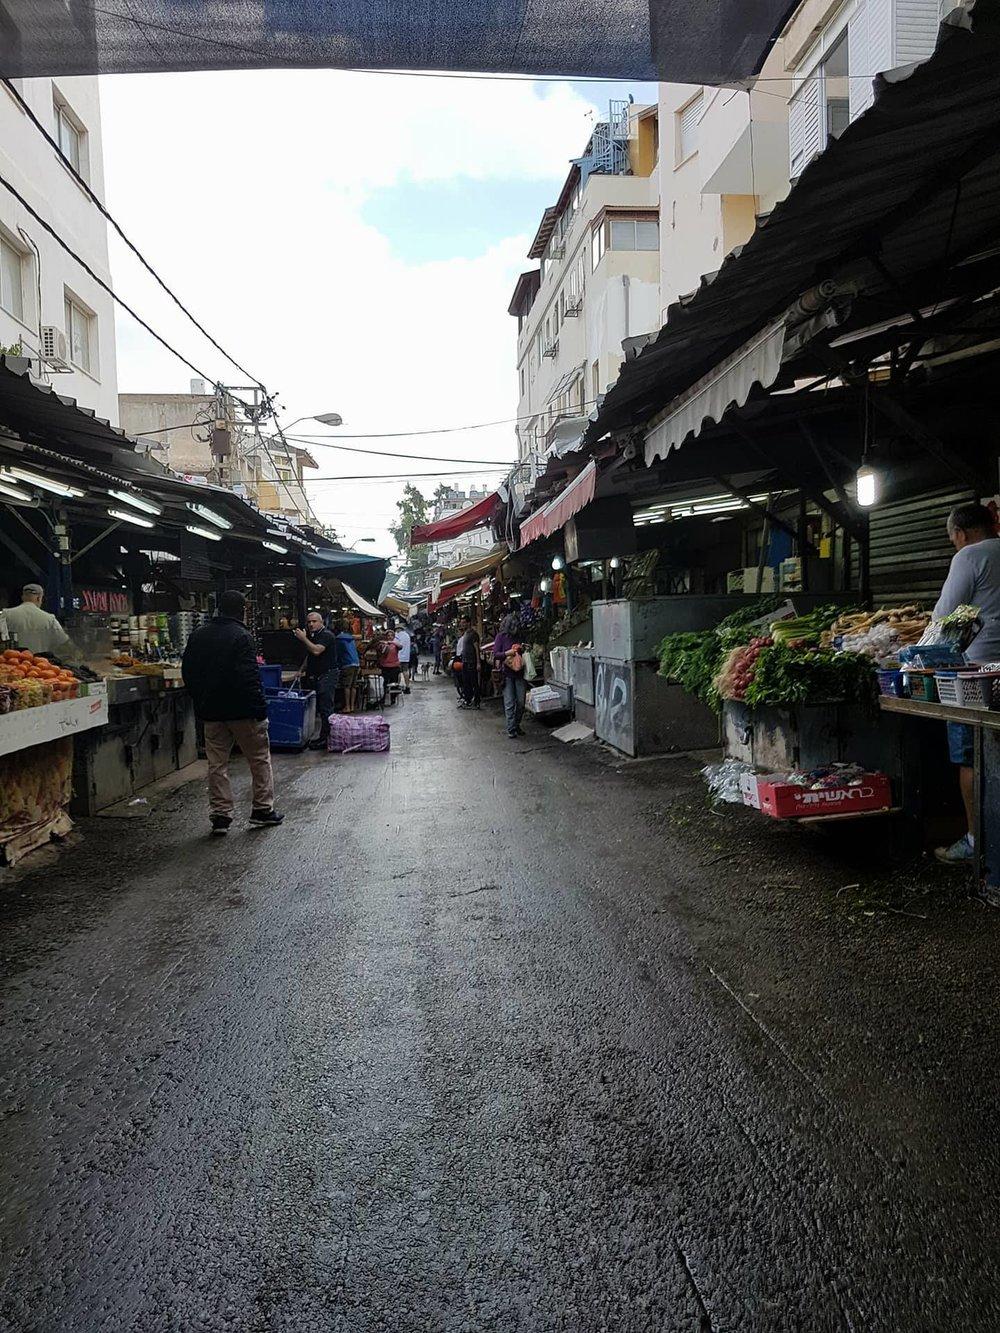 Carmel Market. Copyright: Sherry Bekhet